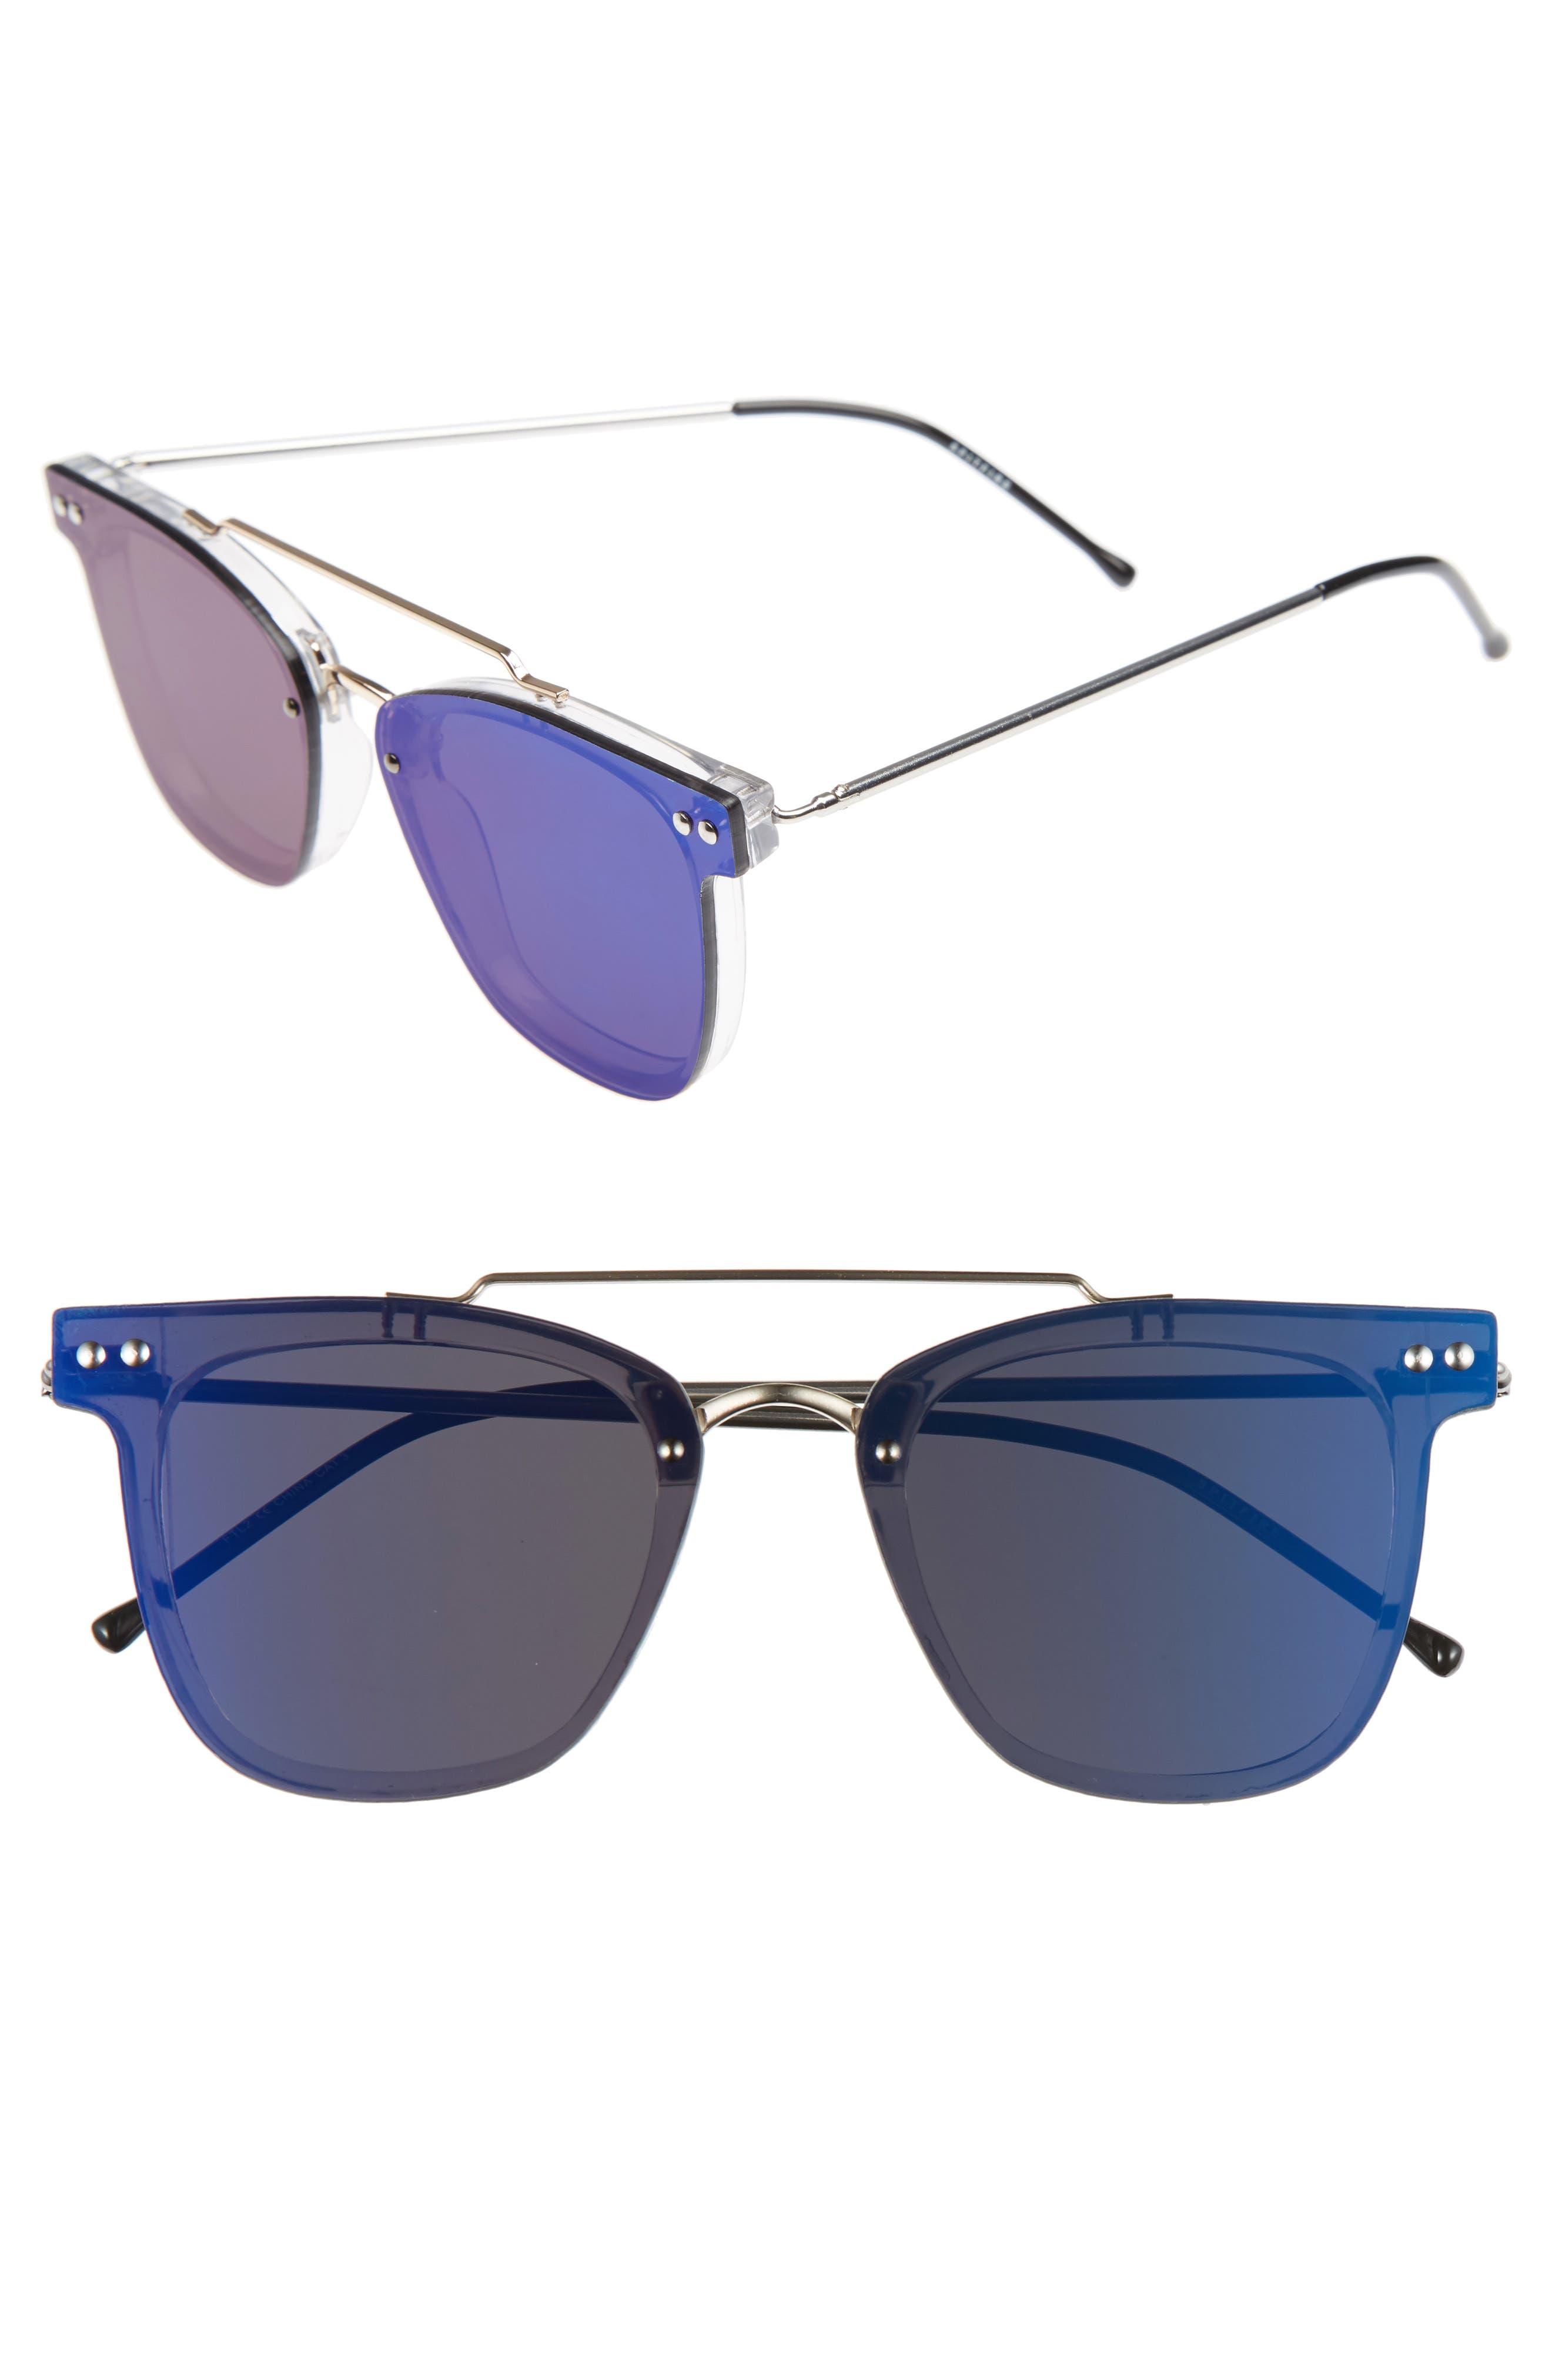 Main Image - Spitfire FTL 2 54mm Flat Frame Sunglasses